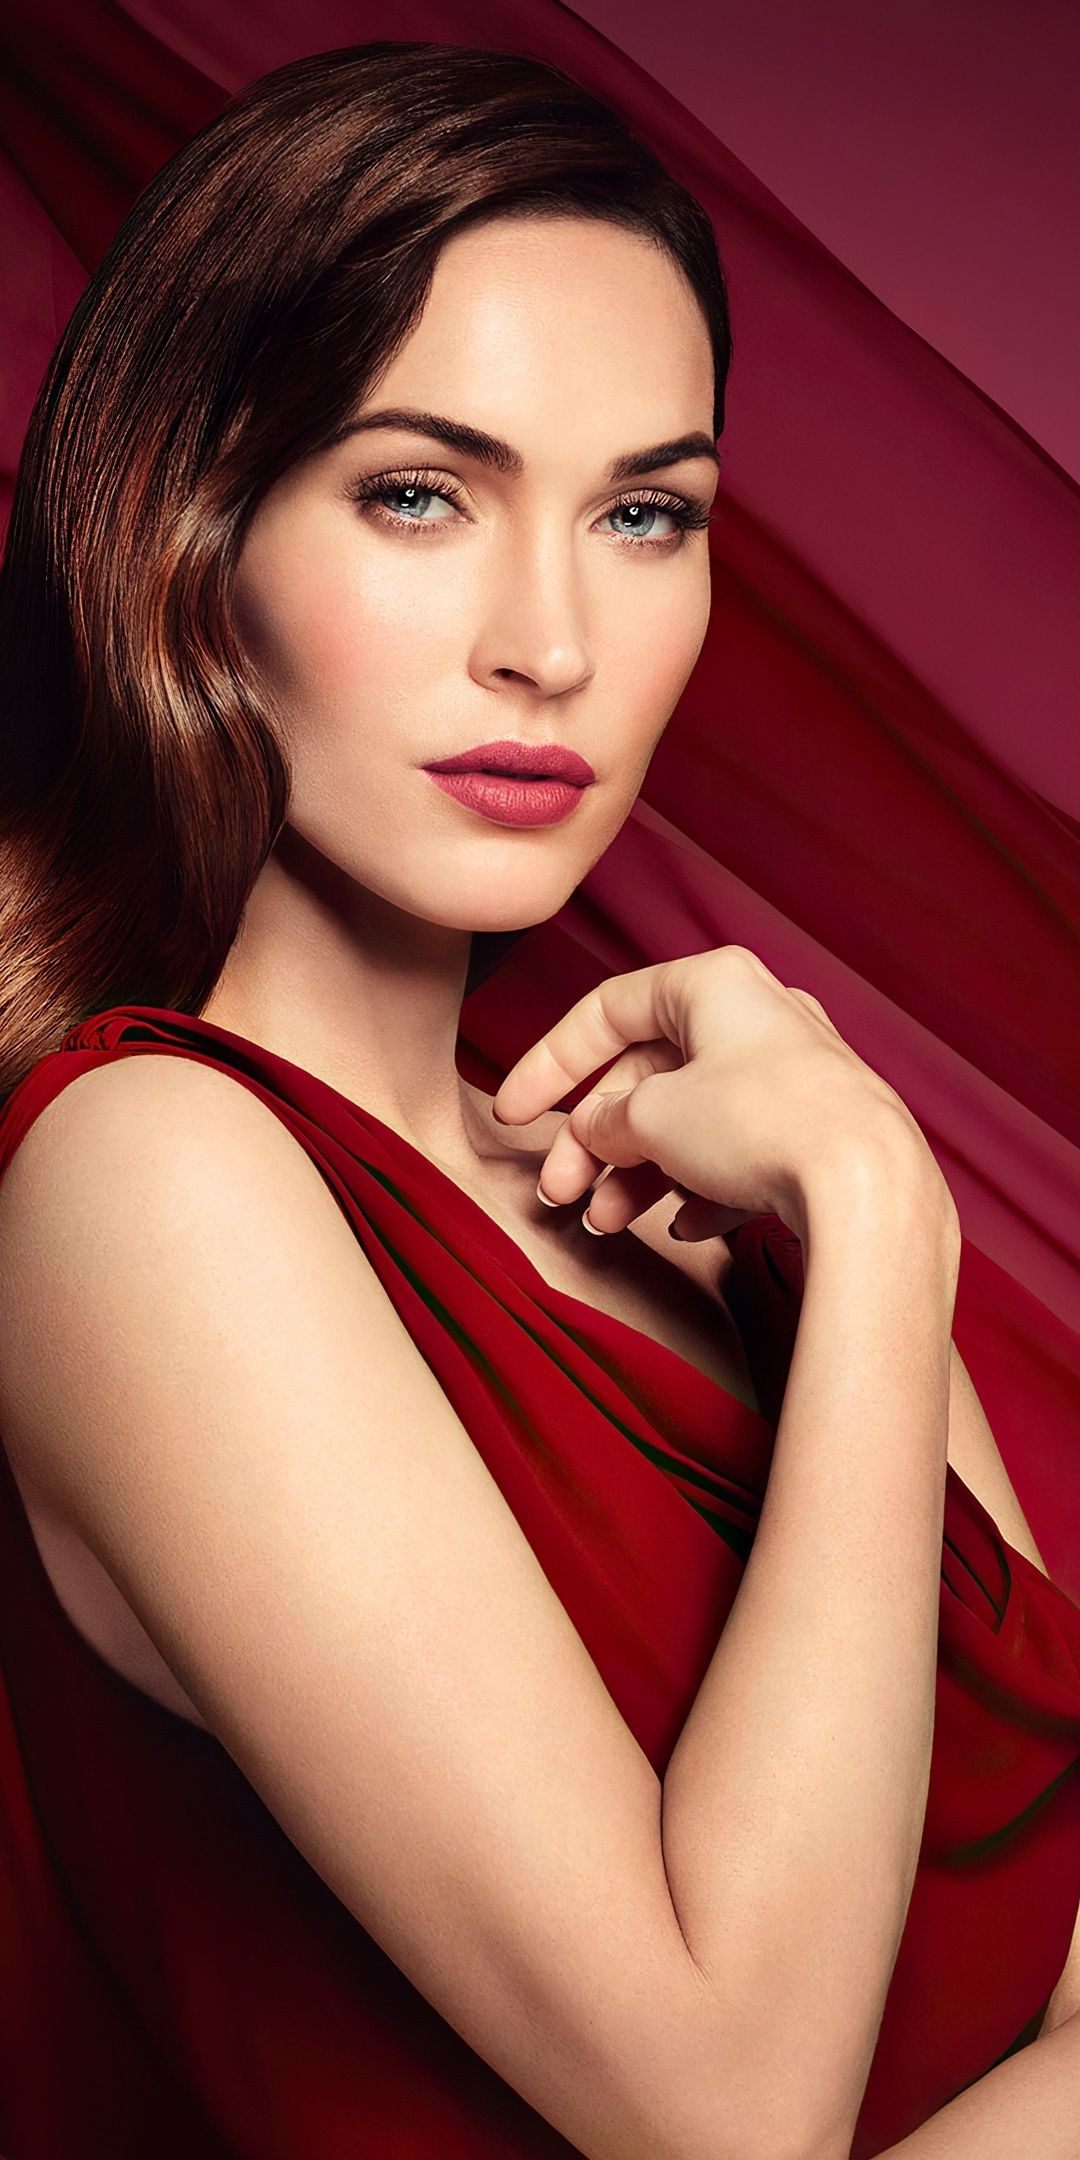 1080x2160 Megan Fox Red Dress 2020 Wallpaper Red Dress Megan Fox Celebrity Wallpapers [ 2160 x 1080 Pixel ]